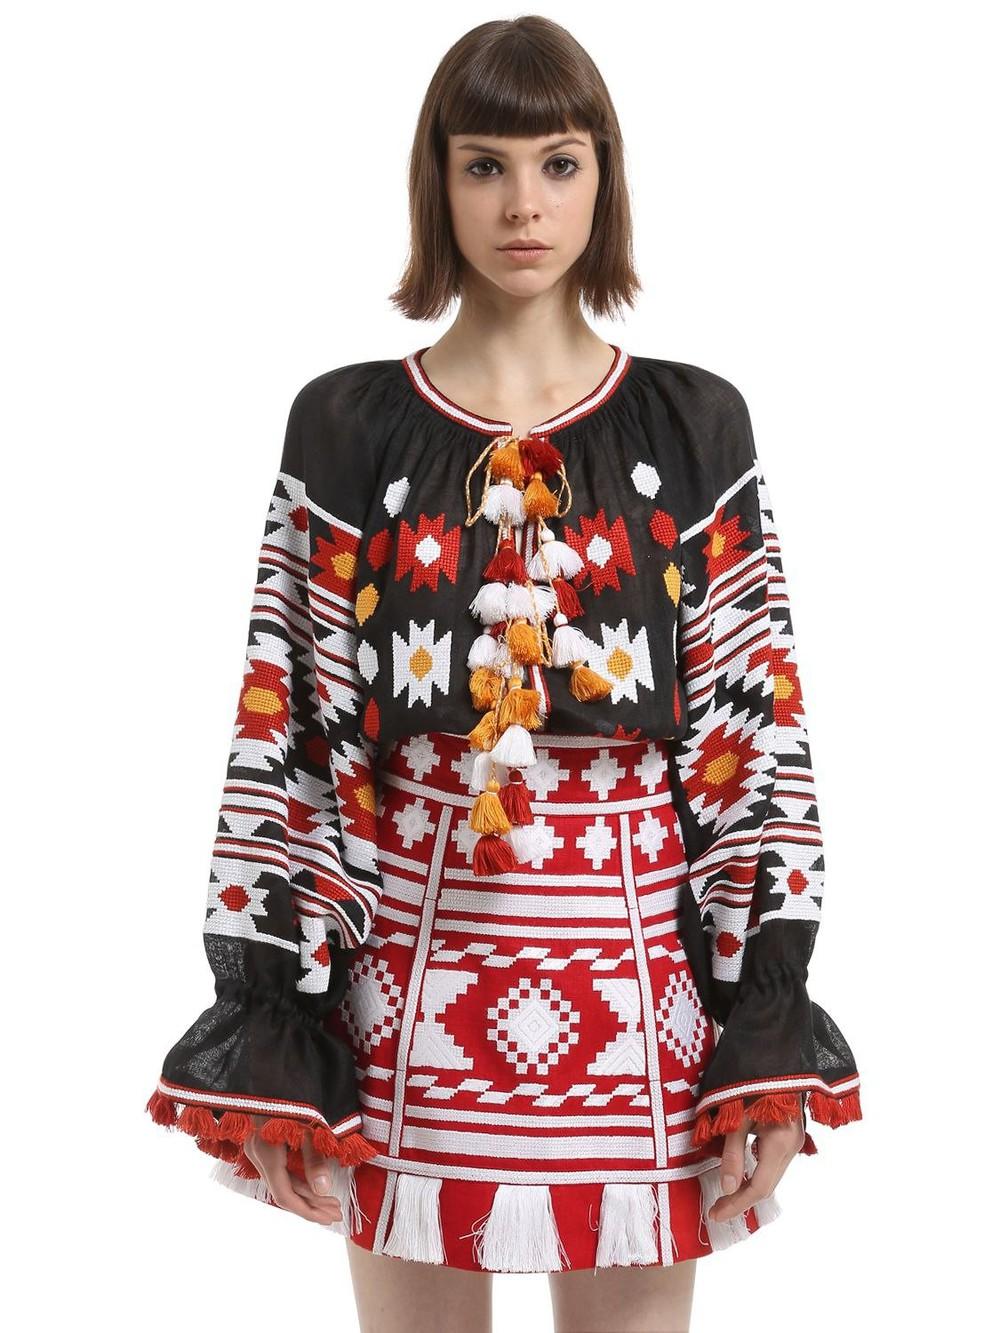 VITA KIN Kilim Embroidered Linen Blouse in black